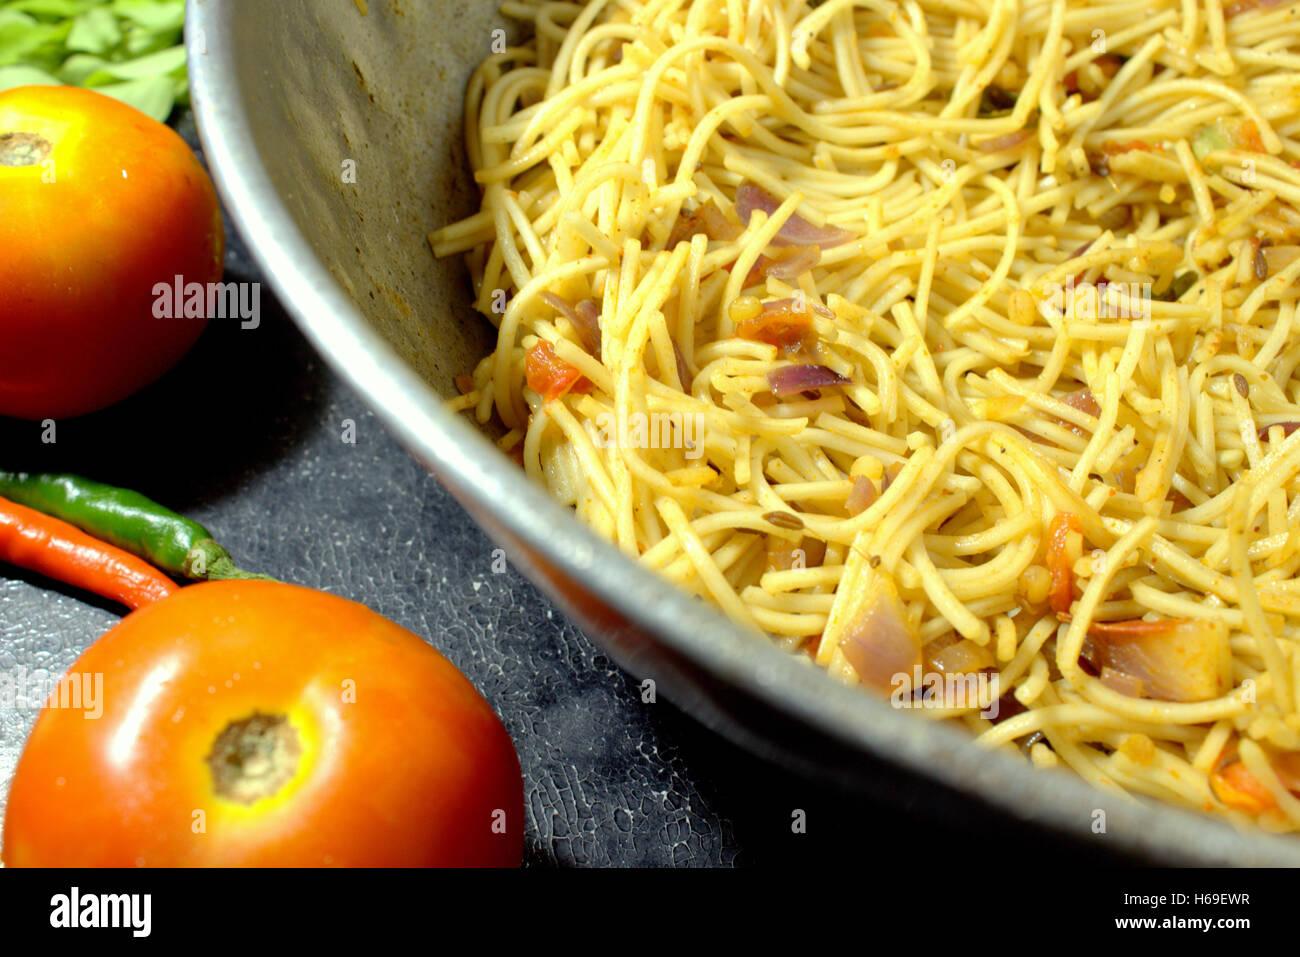 Veg Noodles / Veg Chow-min Stock Photo